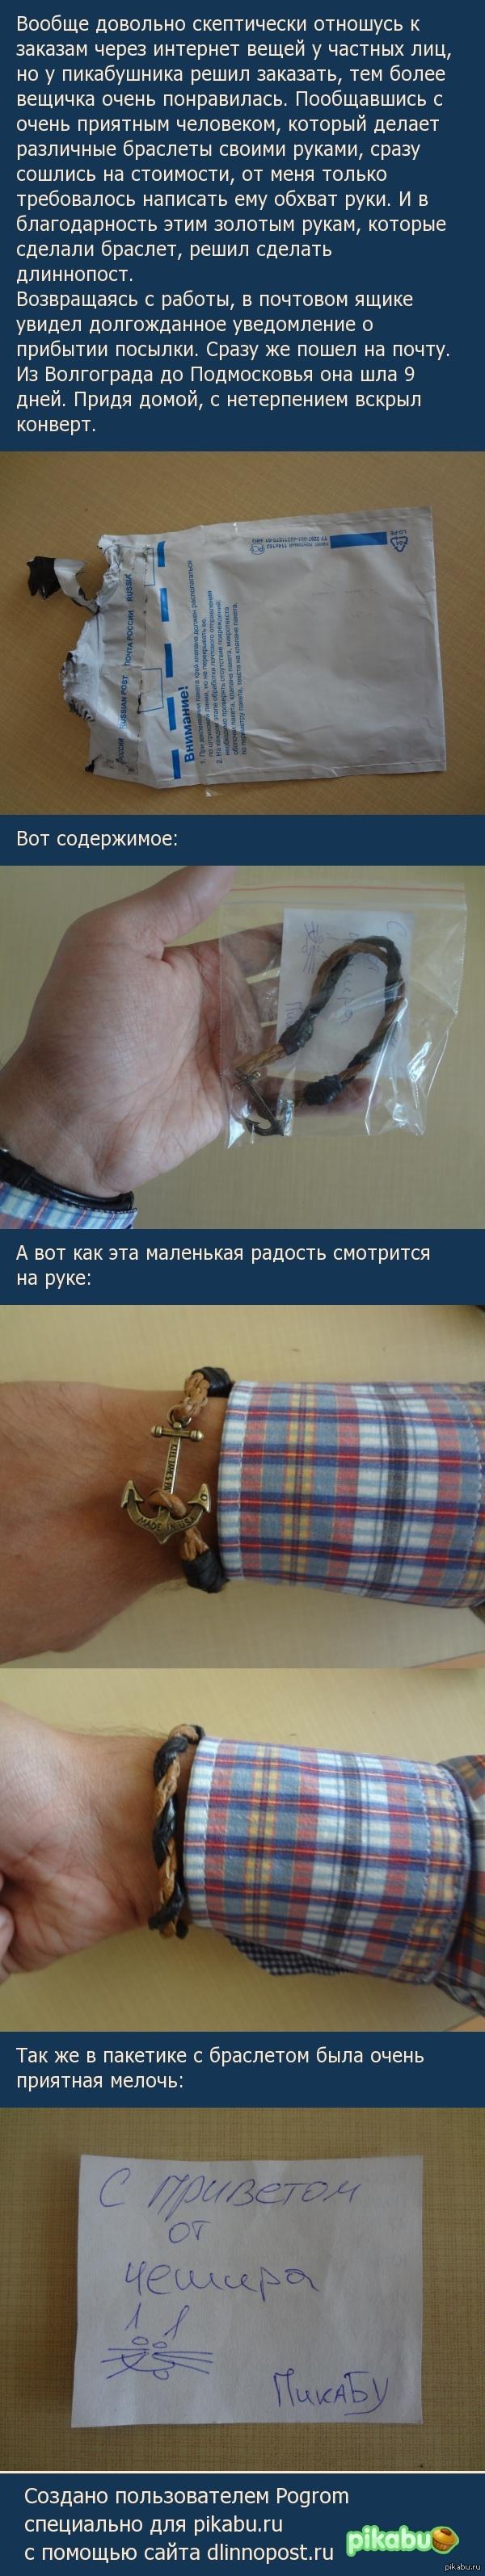 "Посылка от пикабушника Пост мастера, сделавшего этот браслет <a href=""http://pikabu.ru/story/moyo_khobbi_kotoroe_stalo_moey_lyubimoy_rabotoy__2642362"">http://pikabu.ru/story/_2642362</a>"